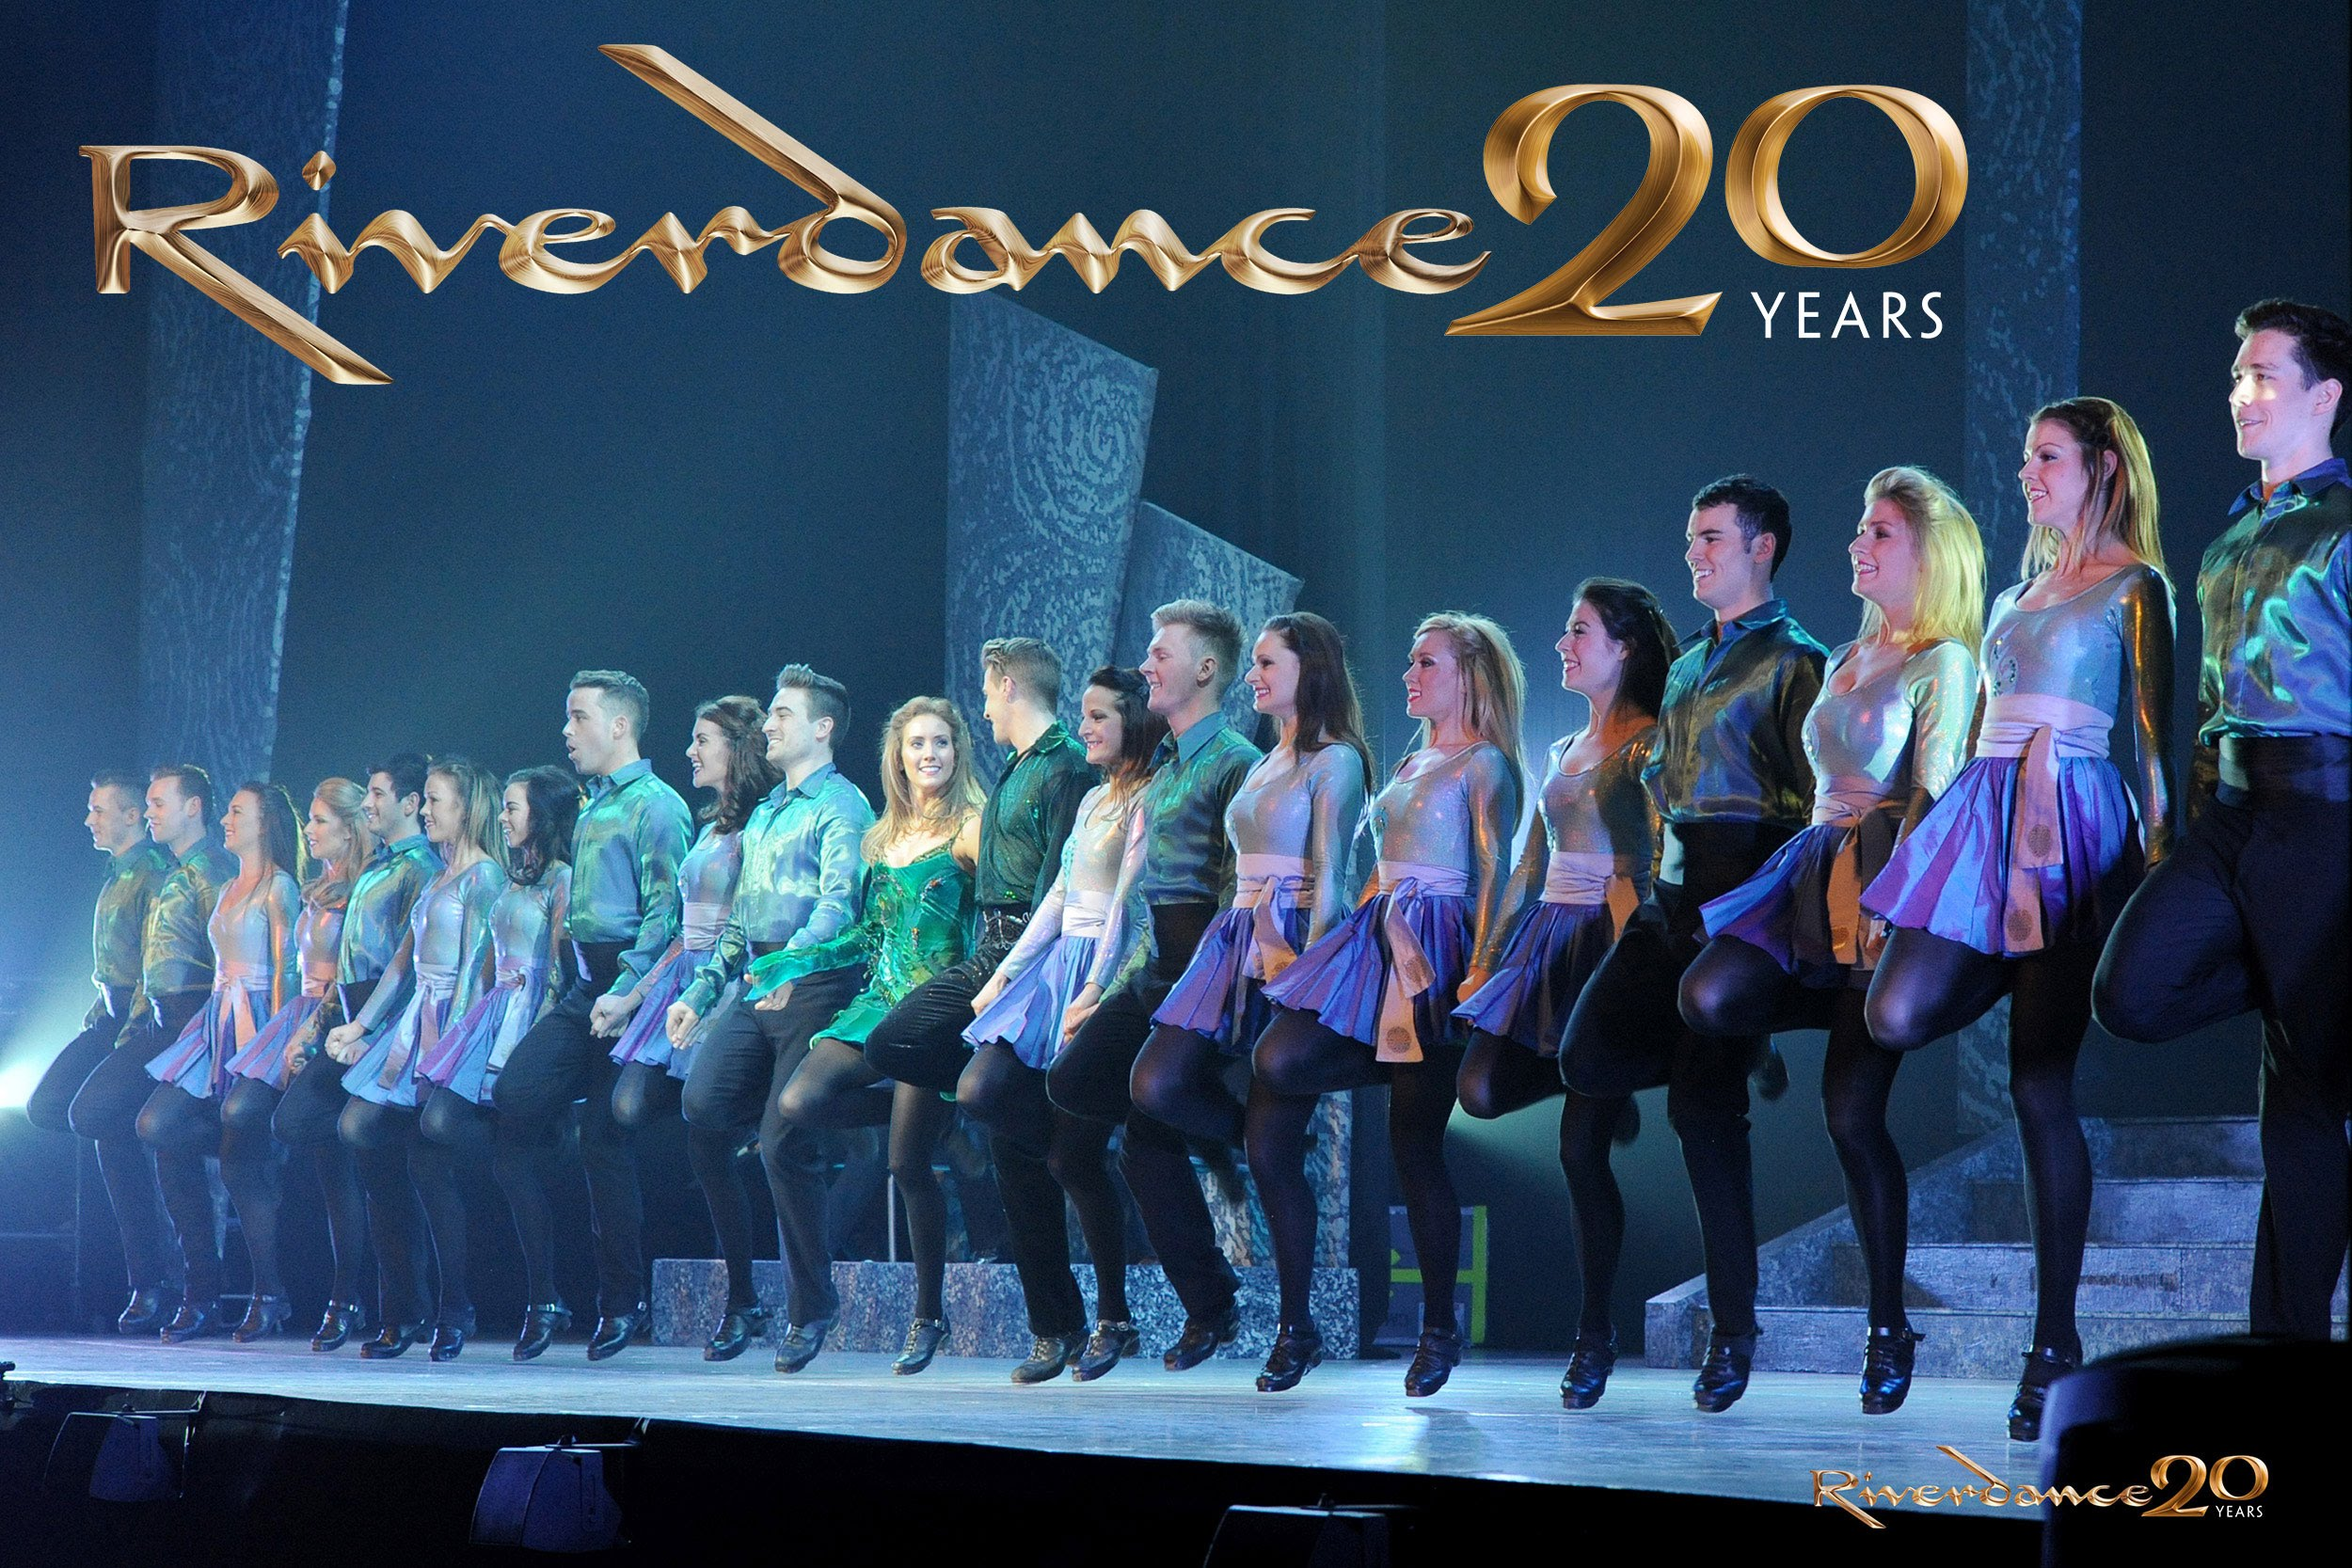 Riverdance 20 Returns to the Gaiety Theatre Dublin 23rd June – 30th August 2015